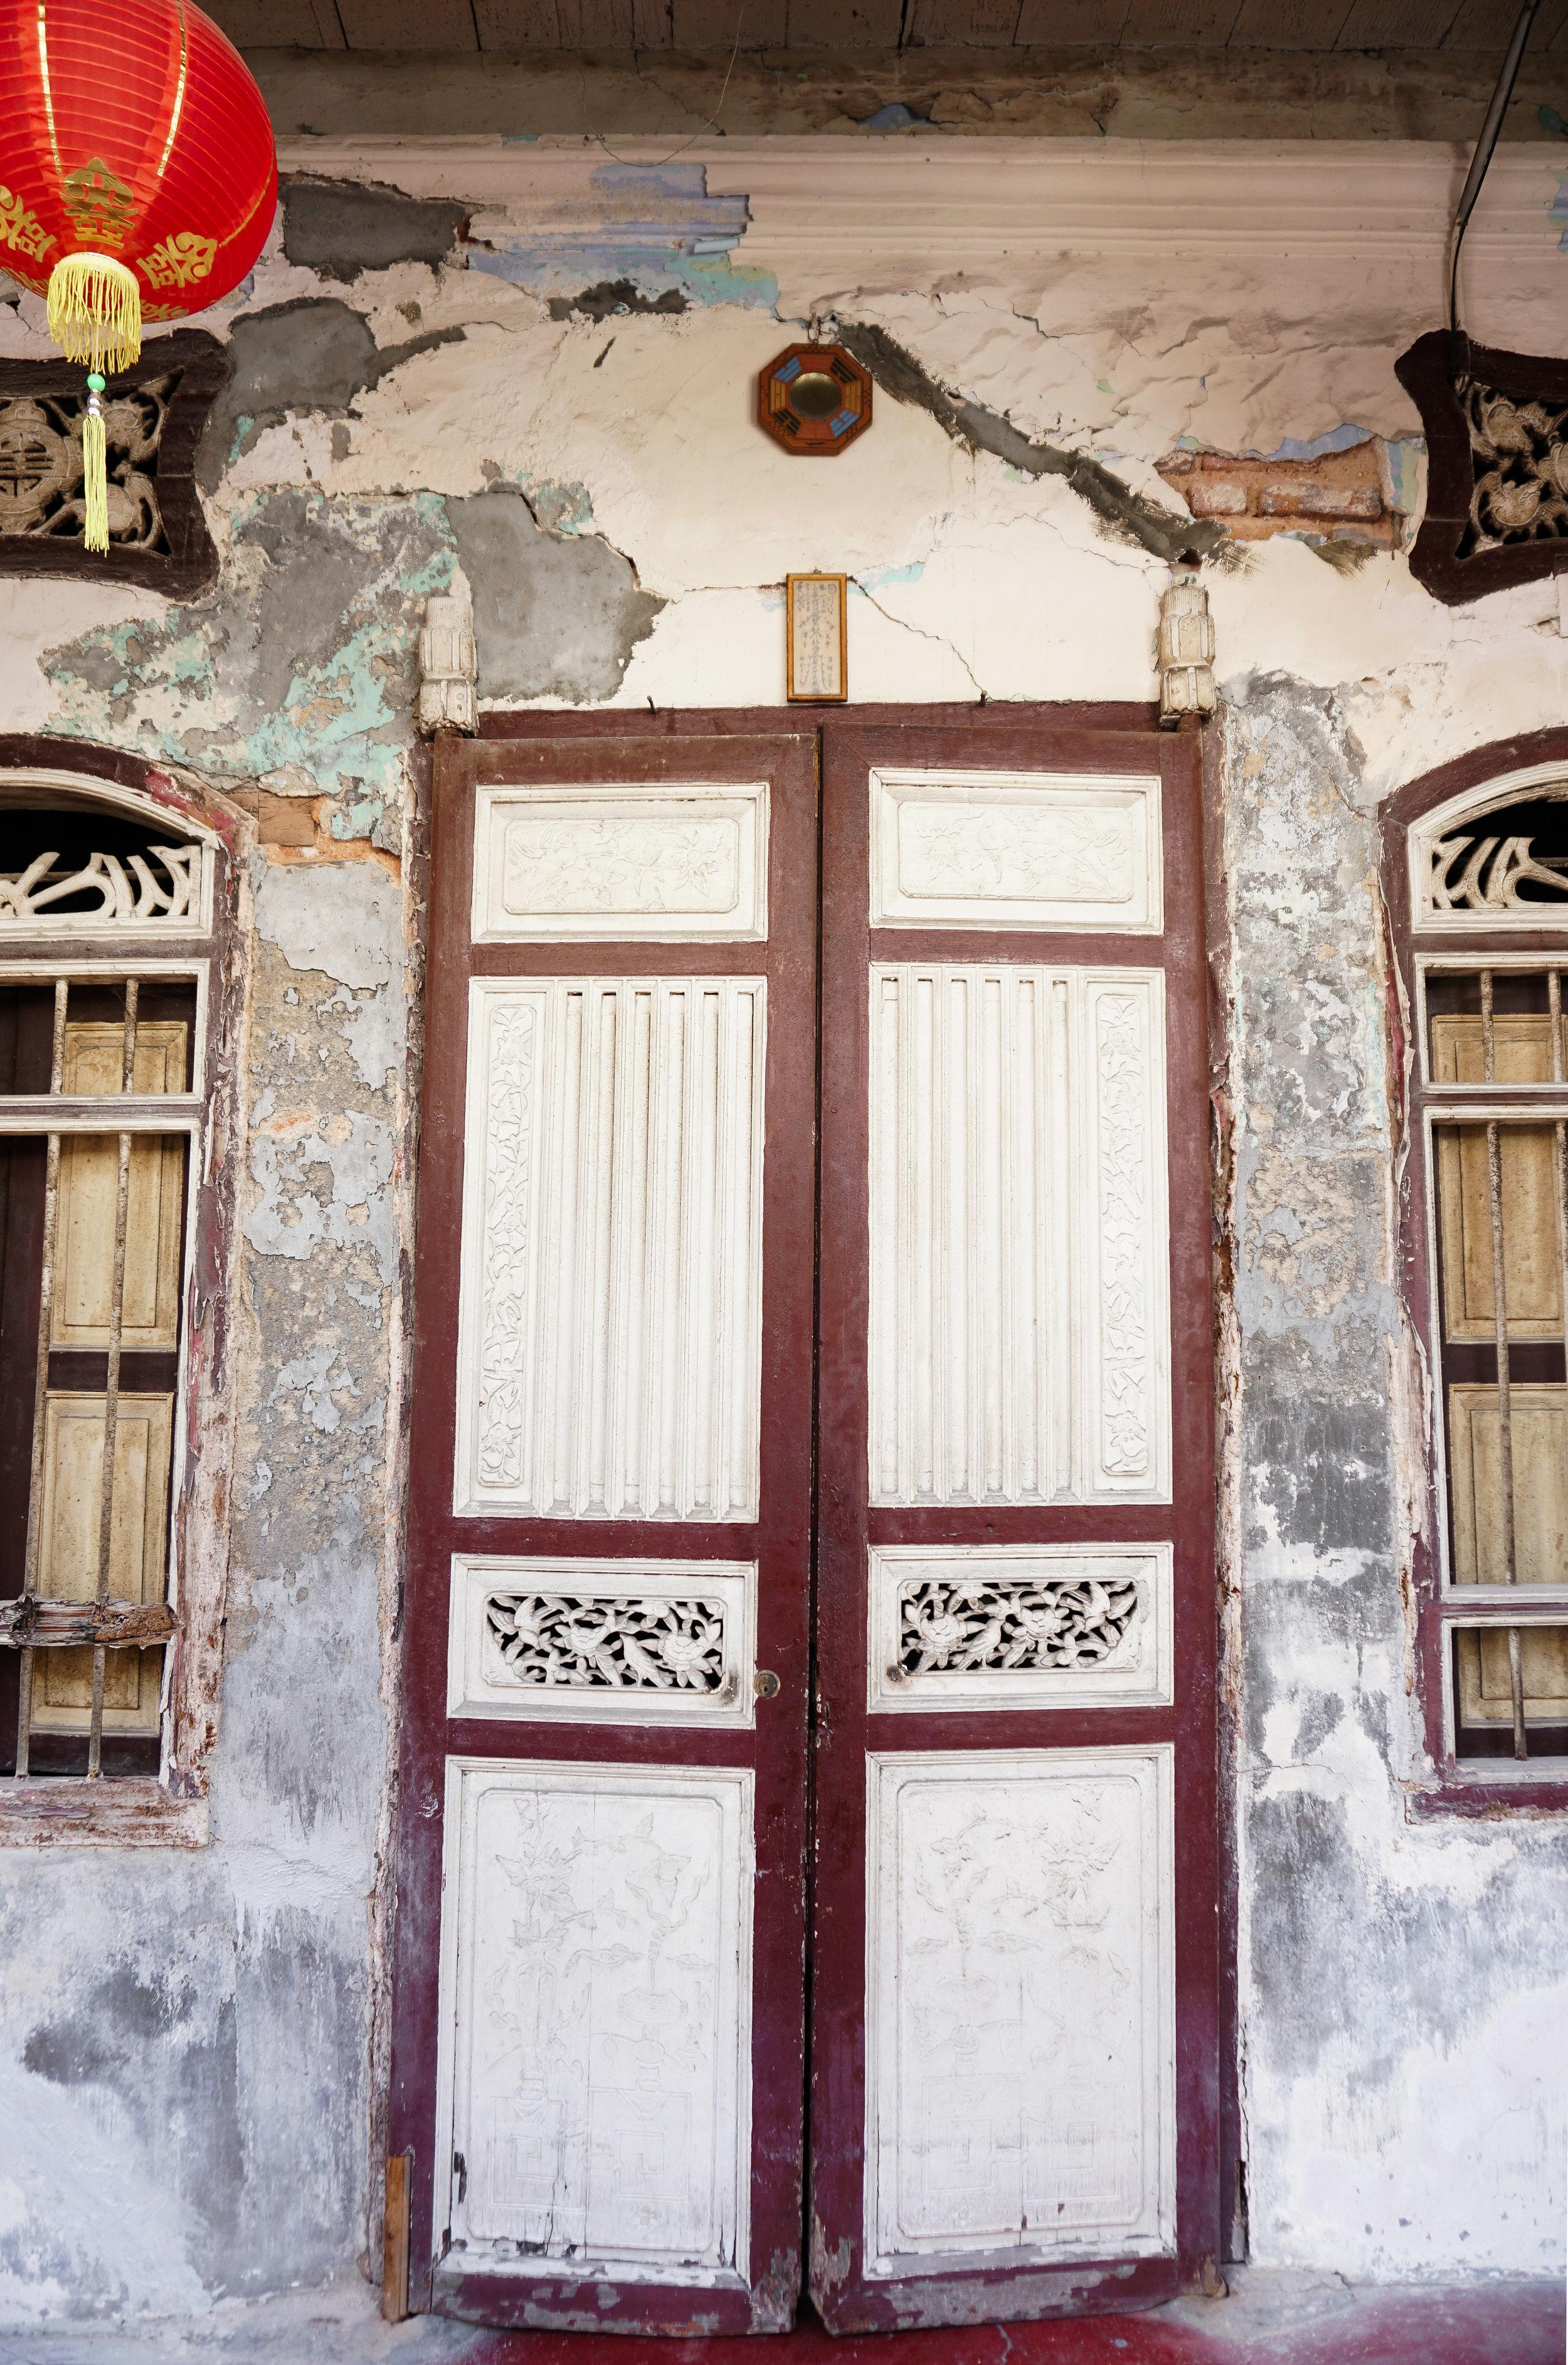 curio.trips.malaysia.penang.white.door.red.lantern.portrait.jpg